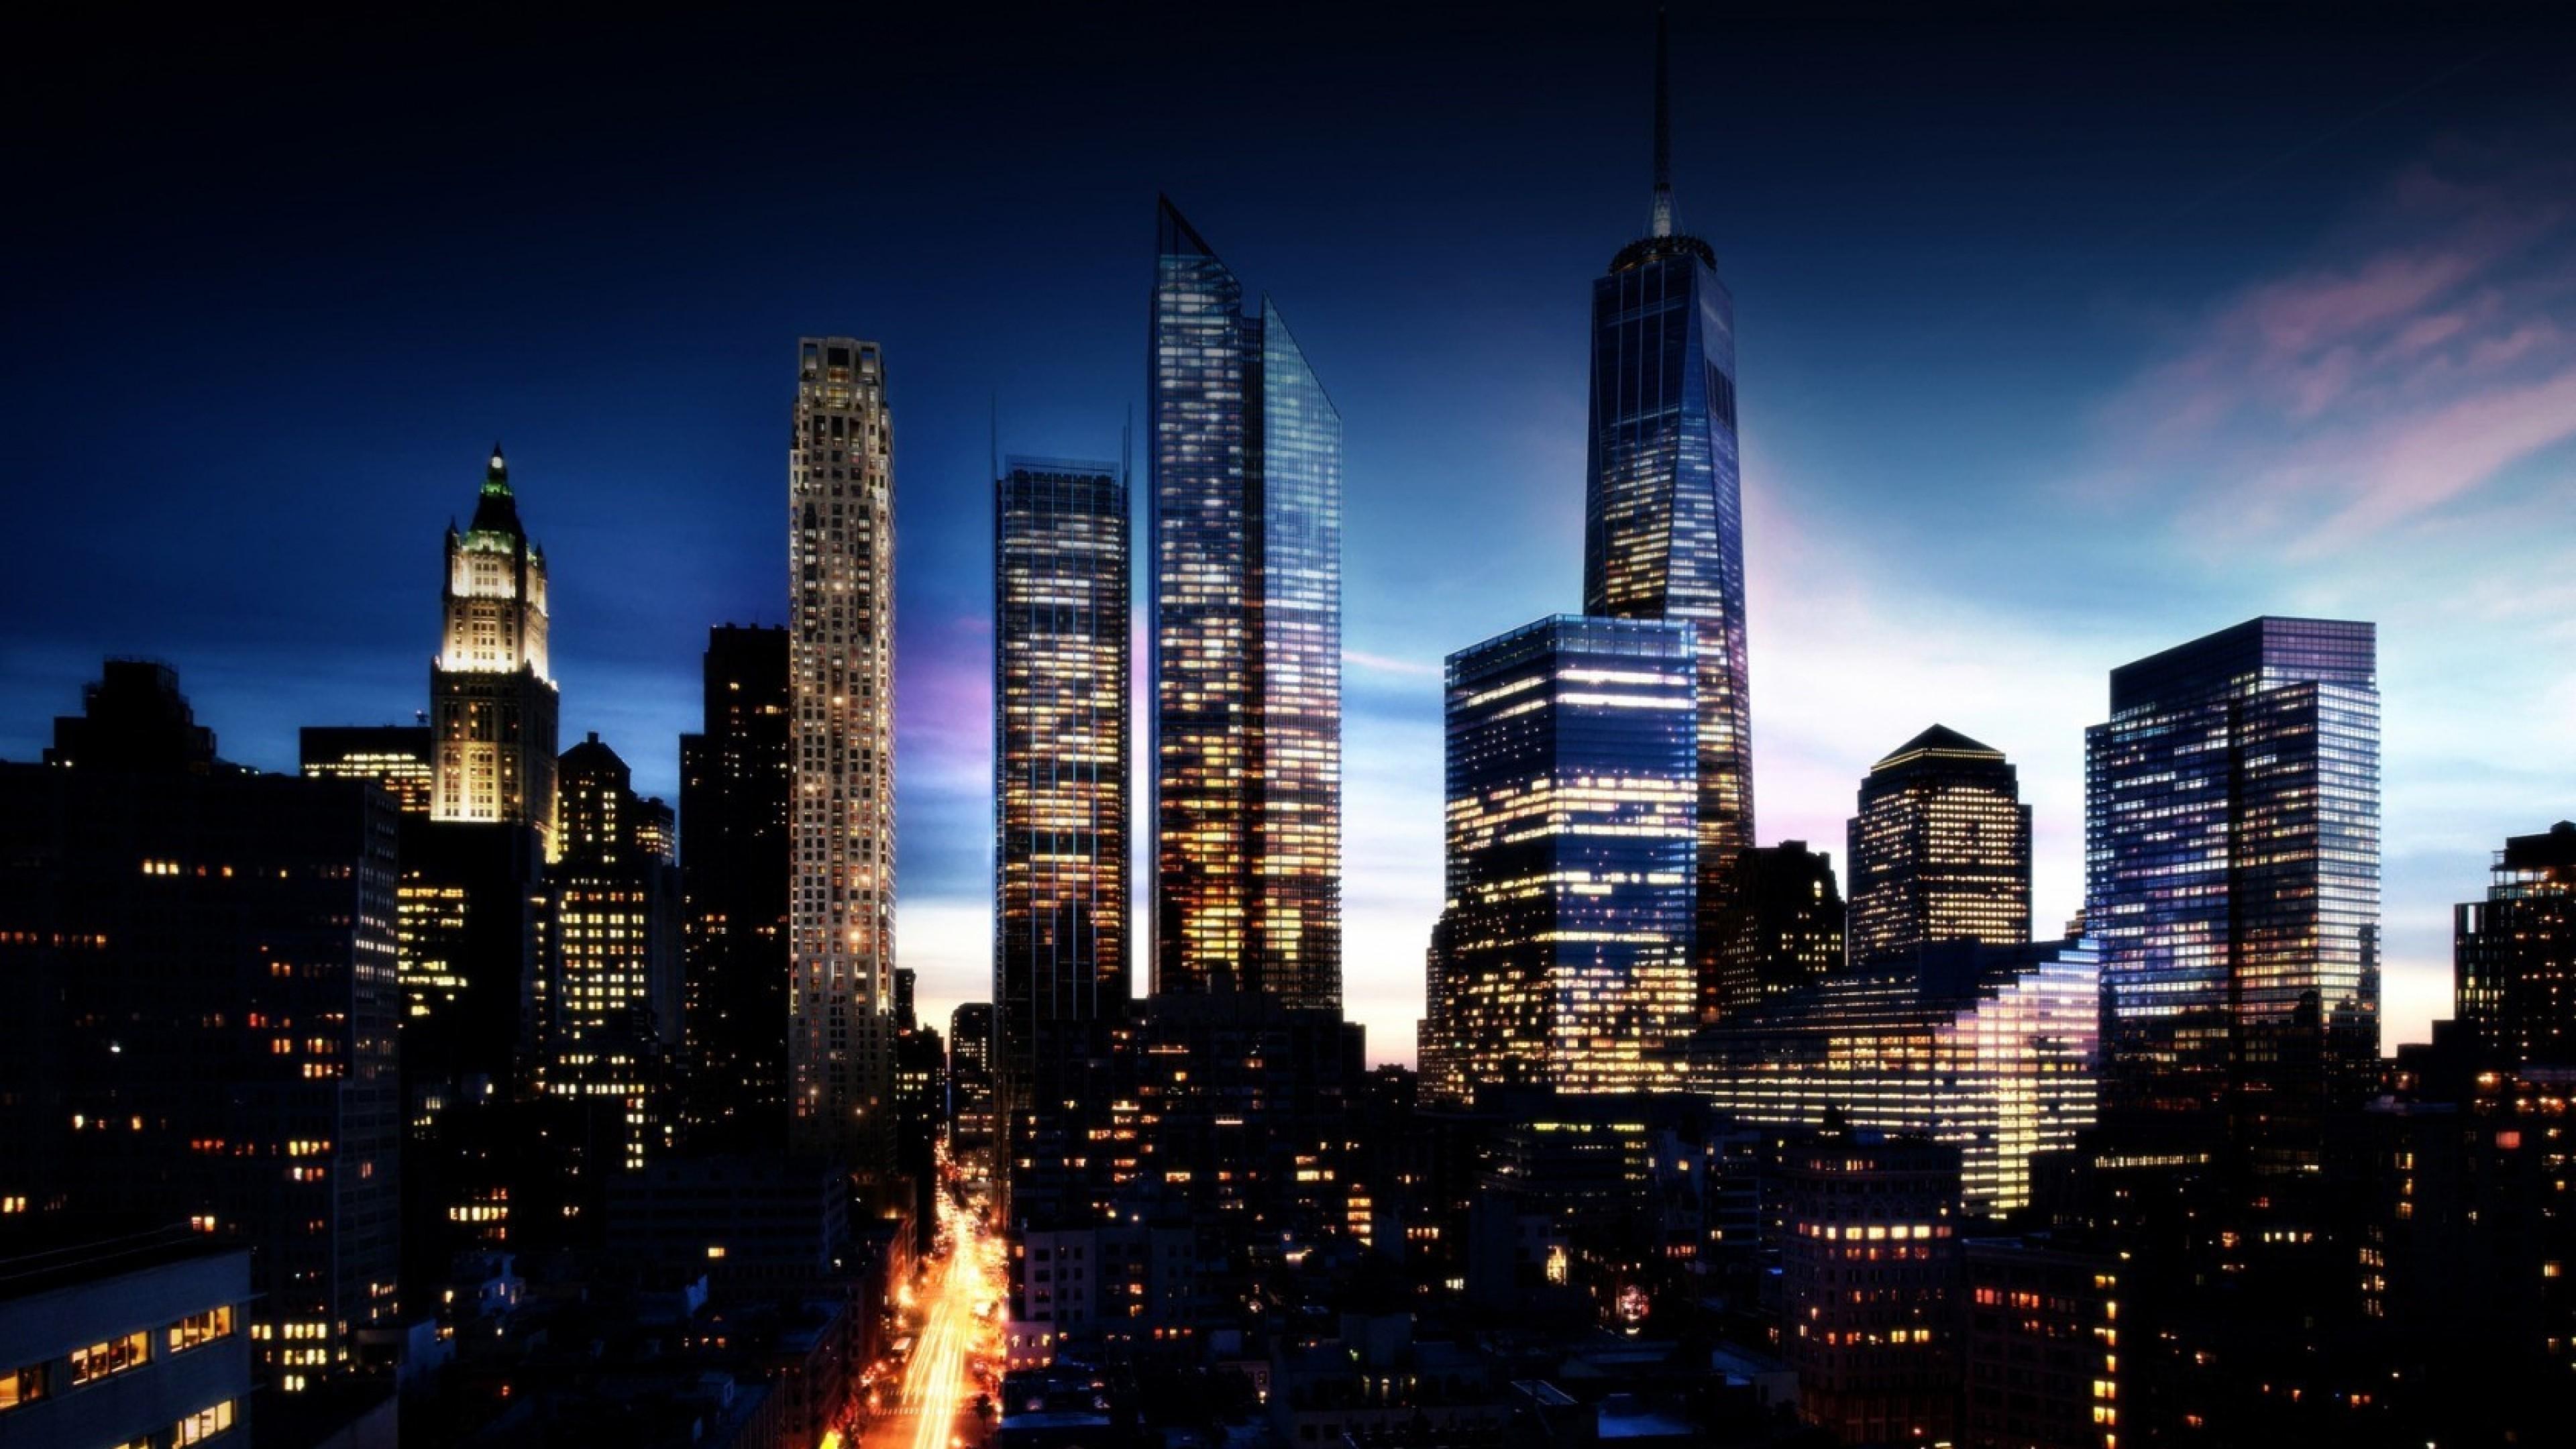 Lights, City lights, Buildings, Sky Wallpaper, Background 4K Ultra .